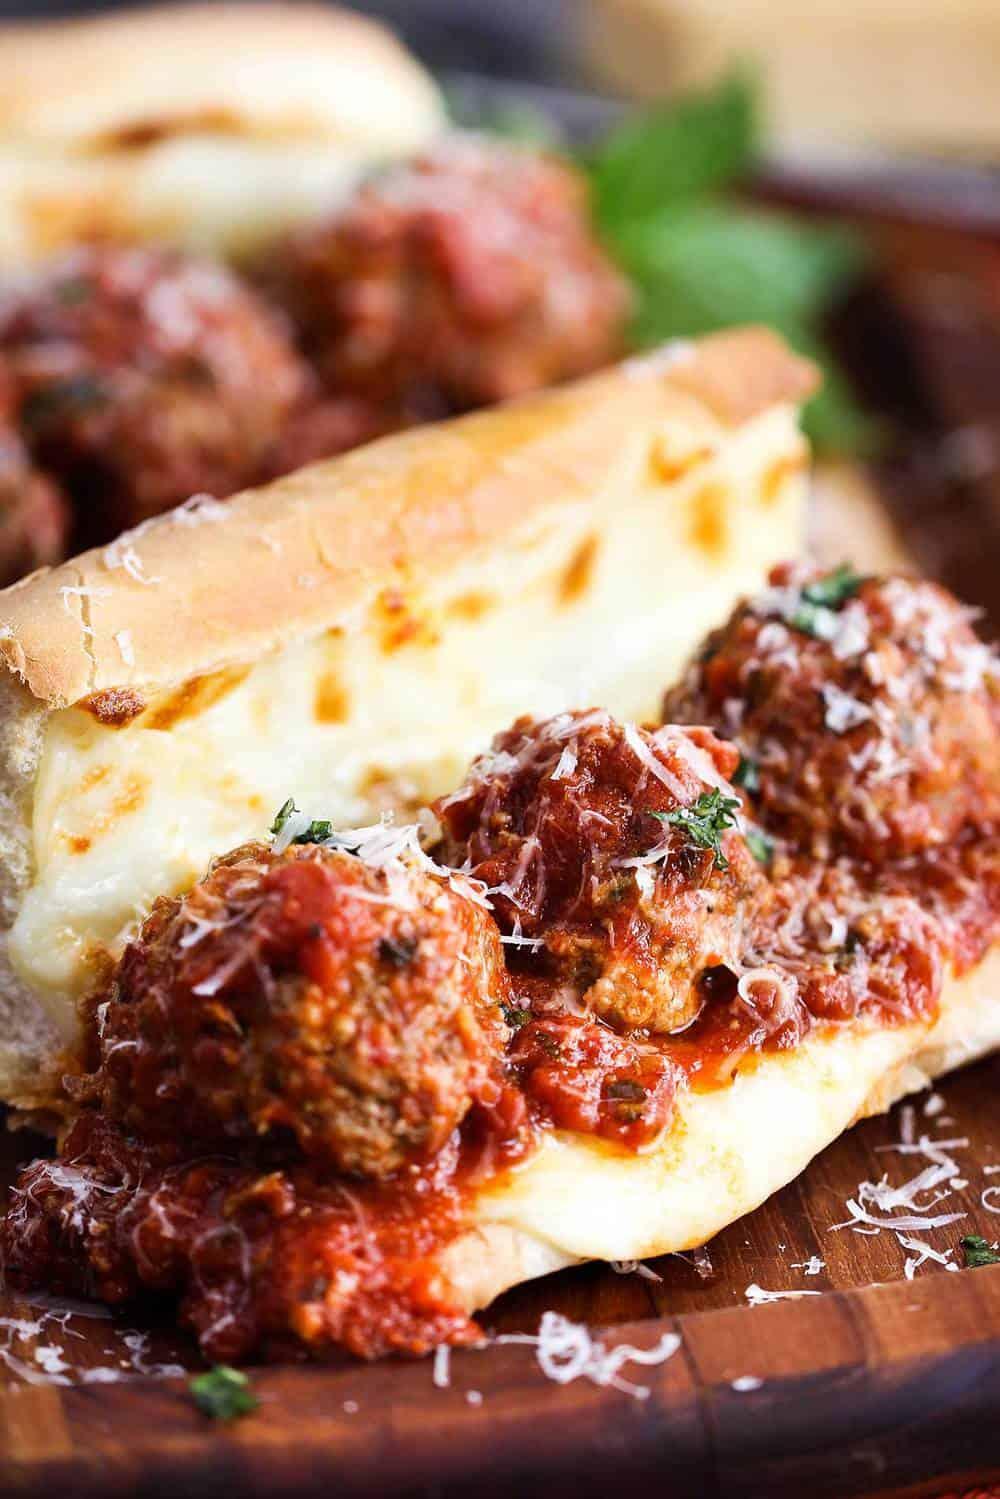 Homemade Italian Meatballs in side a cheesy meatball hero sandwich on a cutting board.